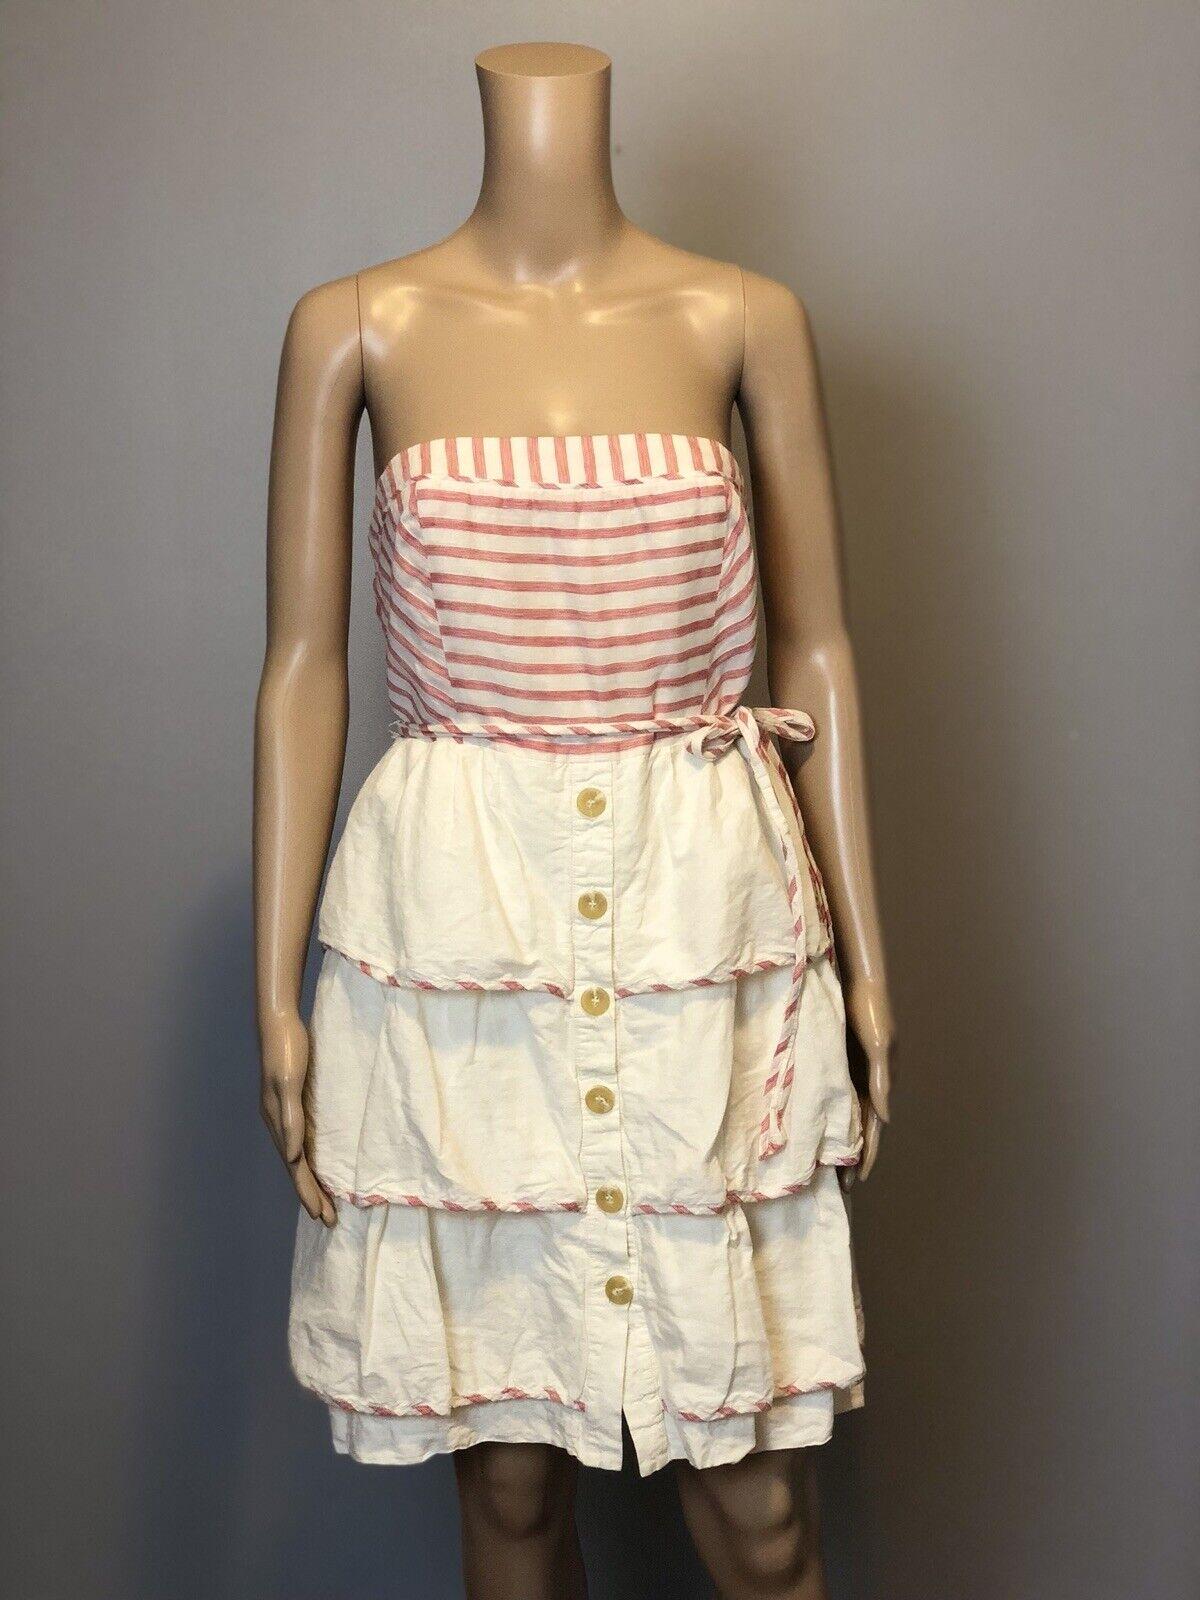 Maeve Anthropologie Strapless Red Stripe Linen Tier Ruffle Dress SZ 8